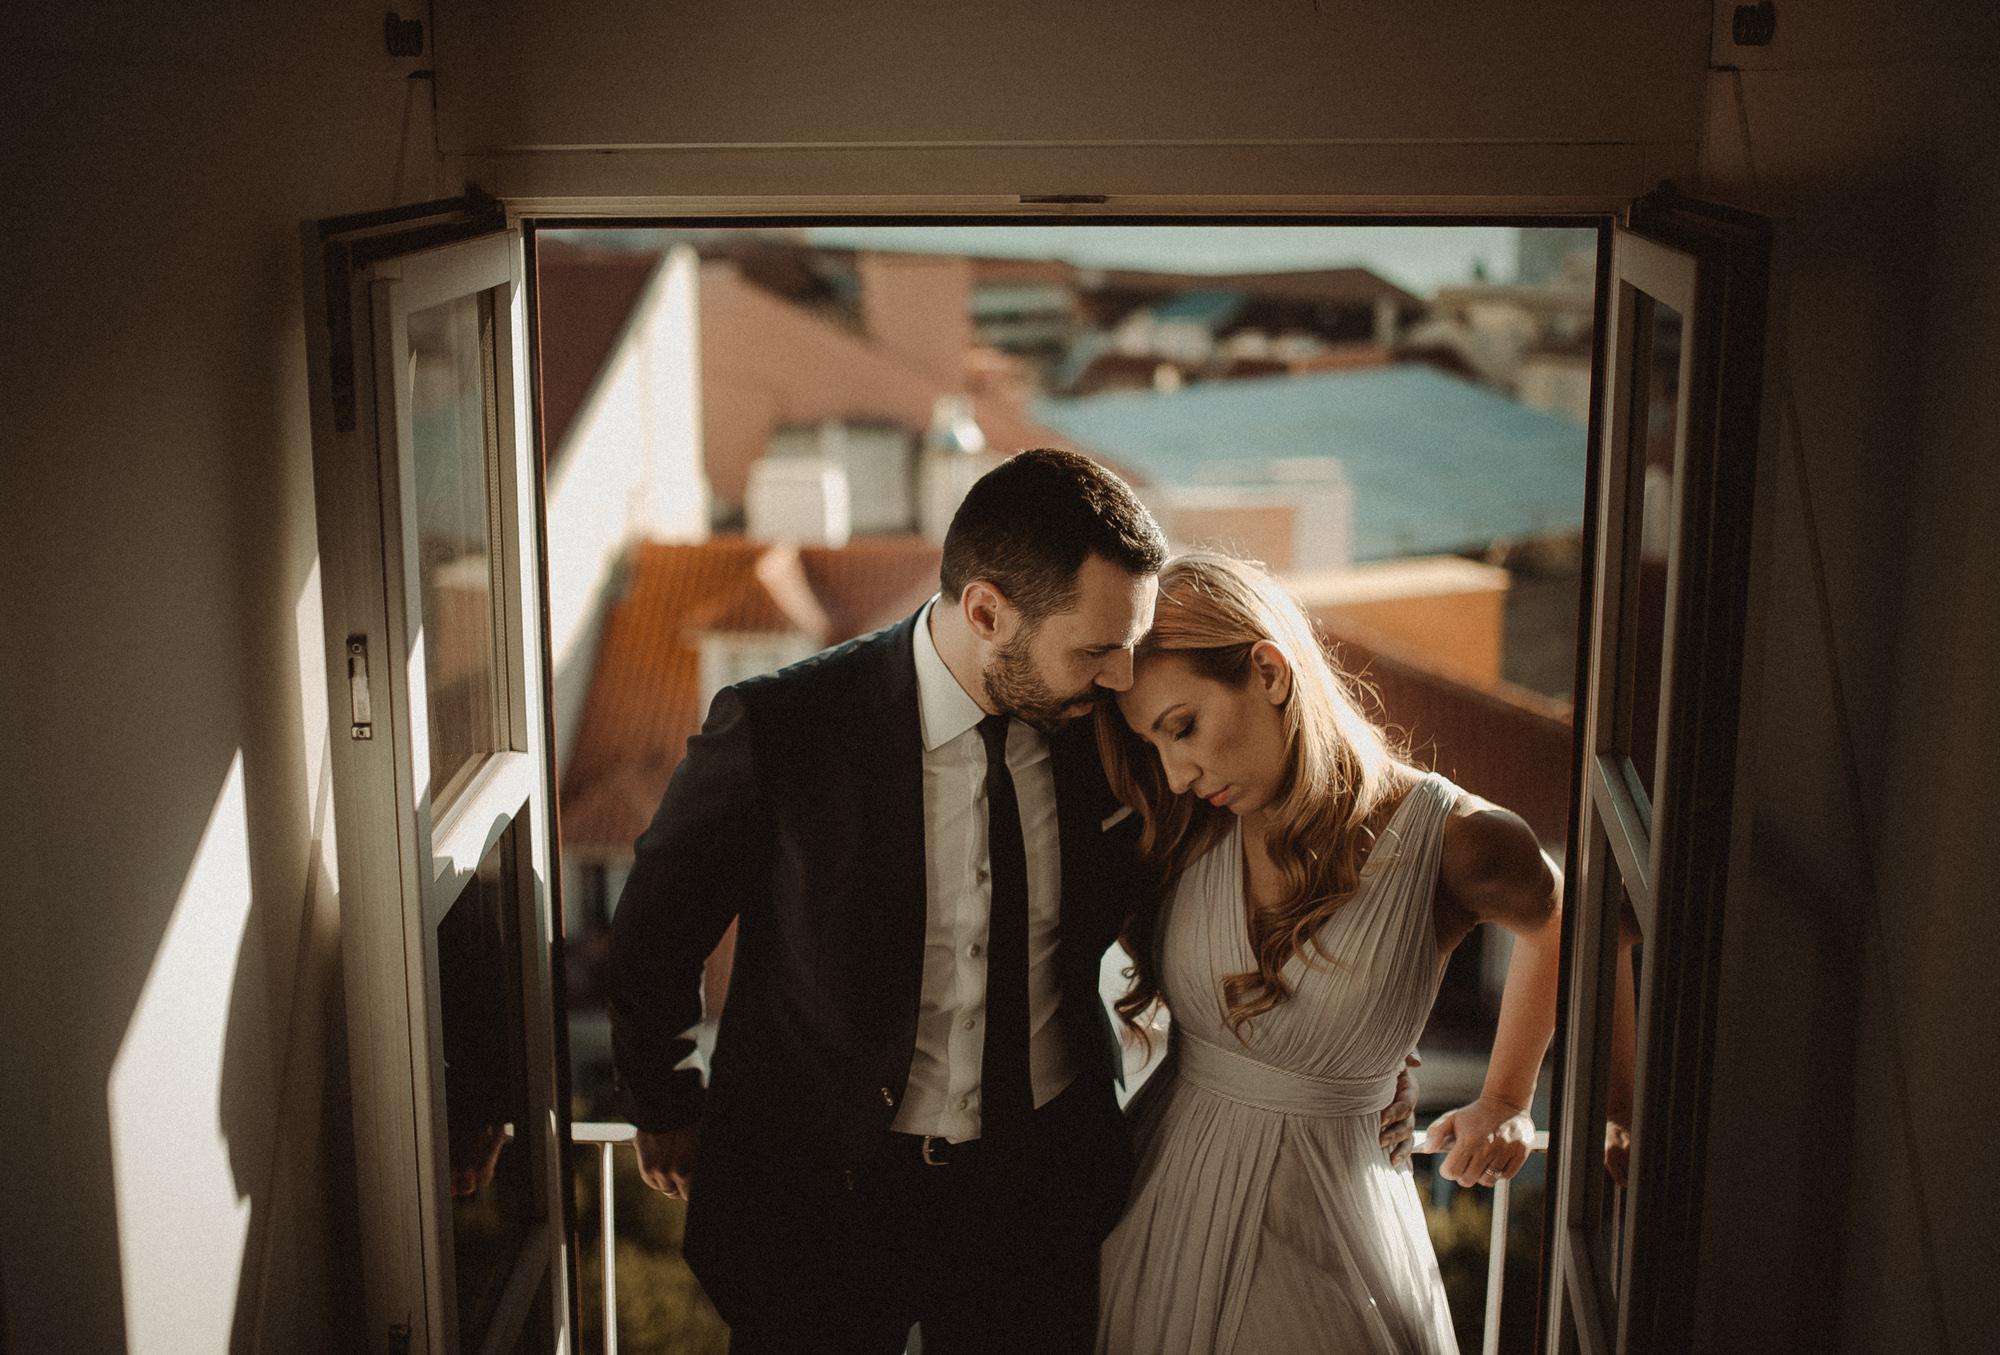 Next day φωτογράφιση γάμου στη Λισαβόνα